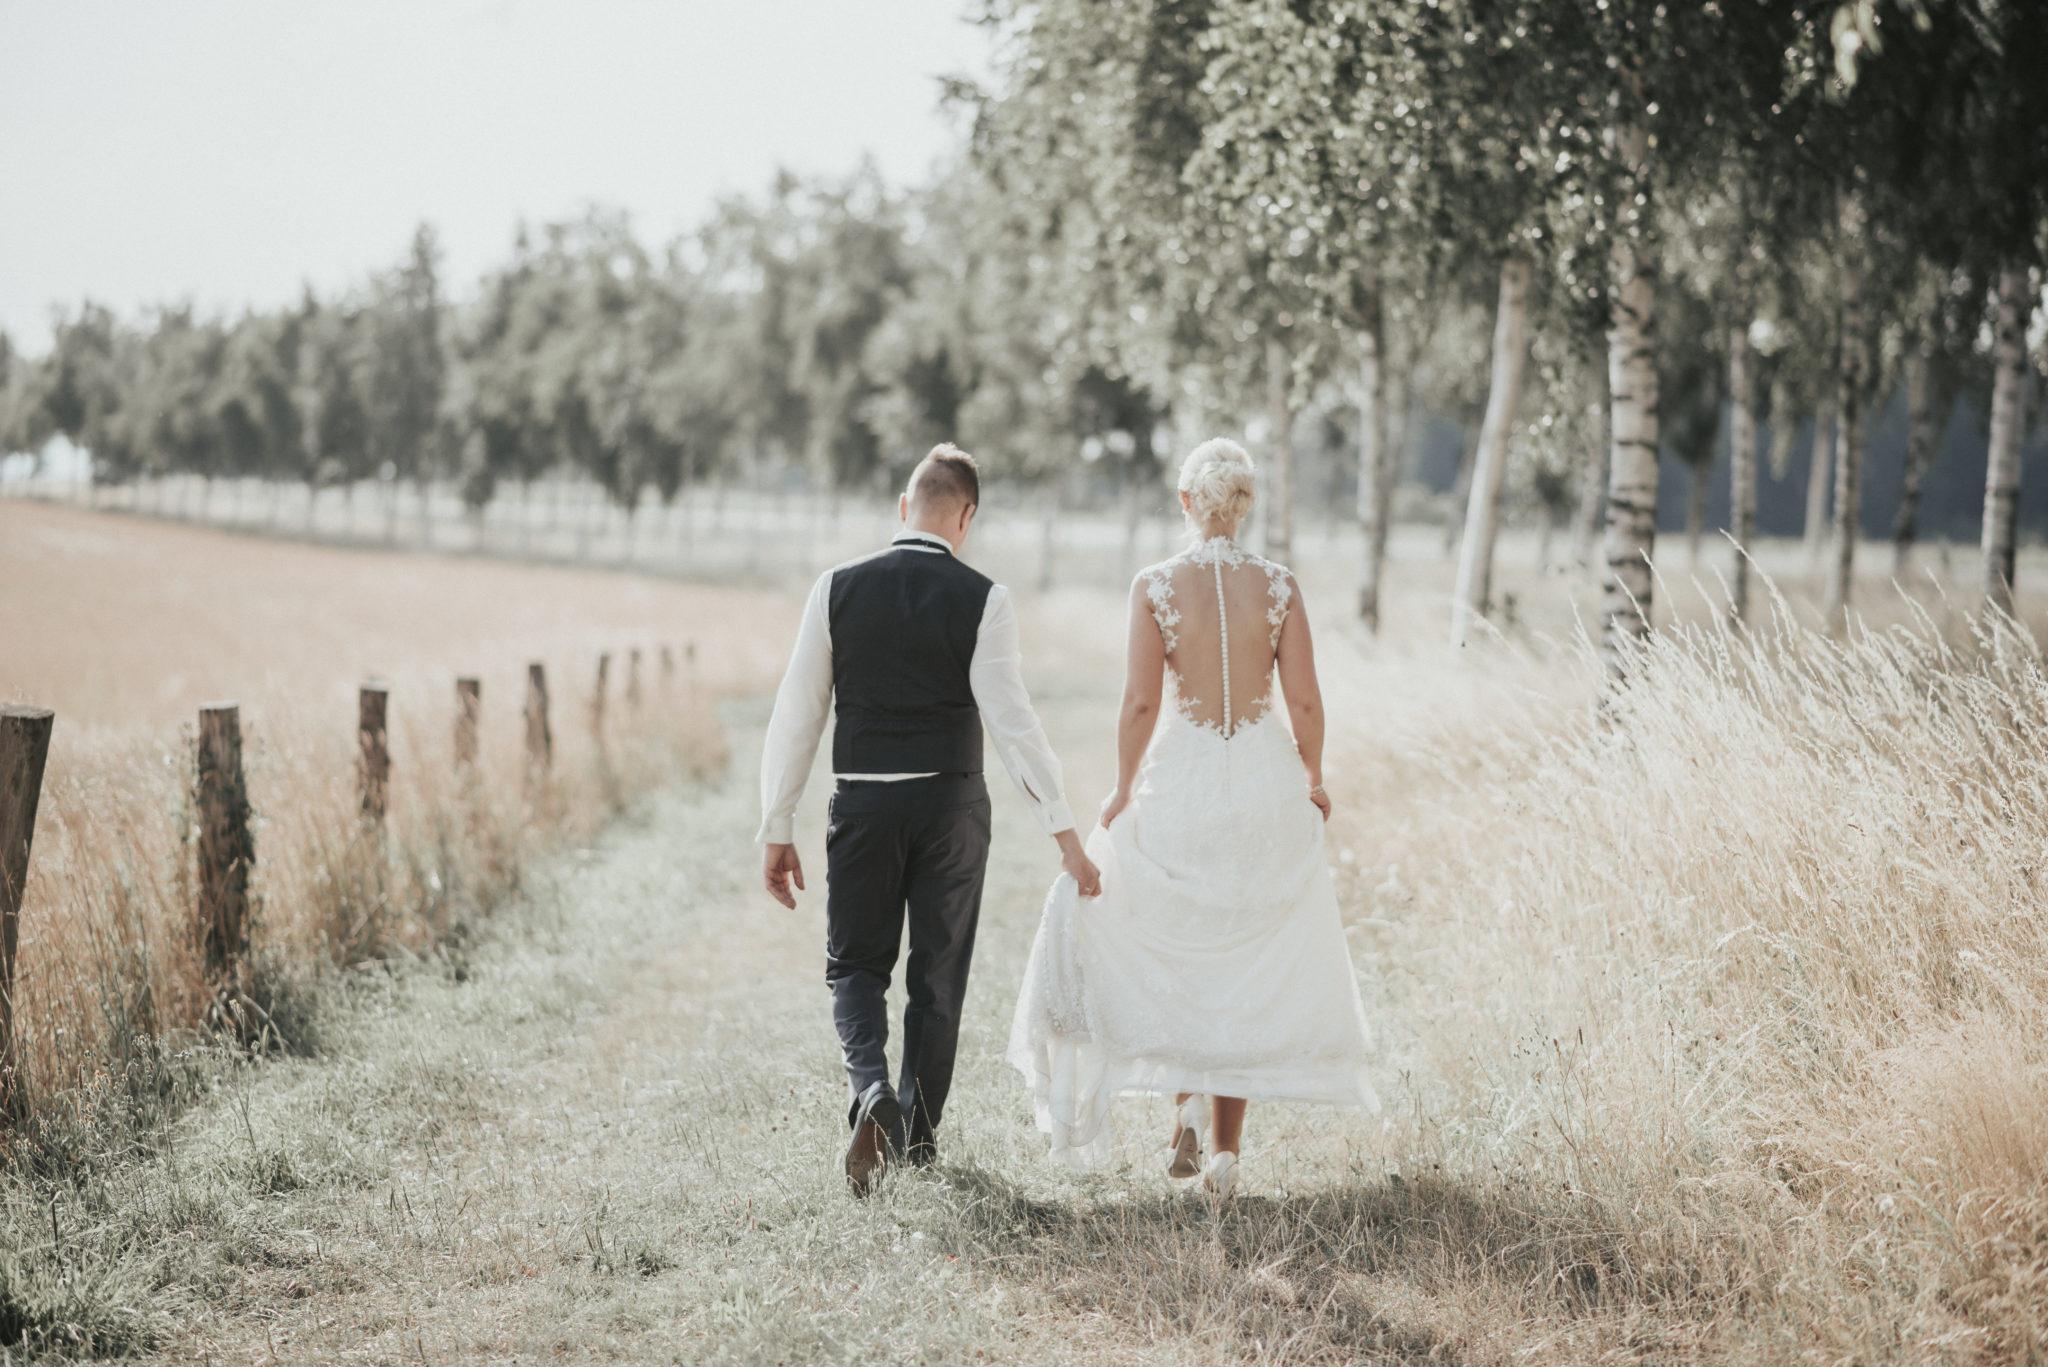 Svenja und Ben Fotografie Hochzeitsfotos Kassel Ostsee Meer Sankt Peter Ording Mallorca Elopement Weddingphotographer Hochzeitsfotografen Duderstadt